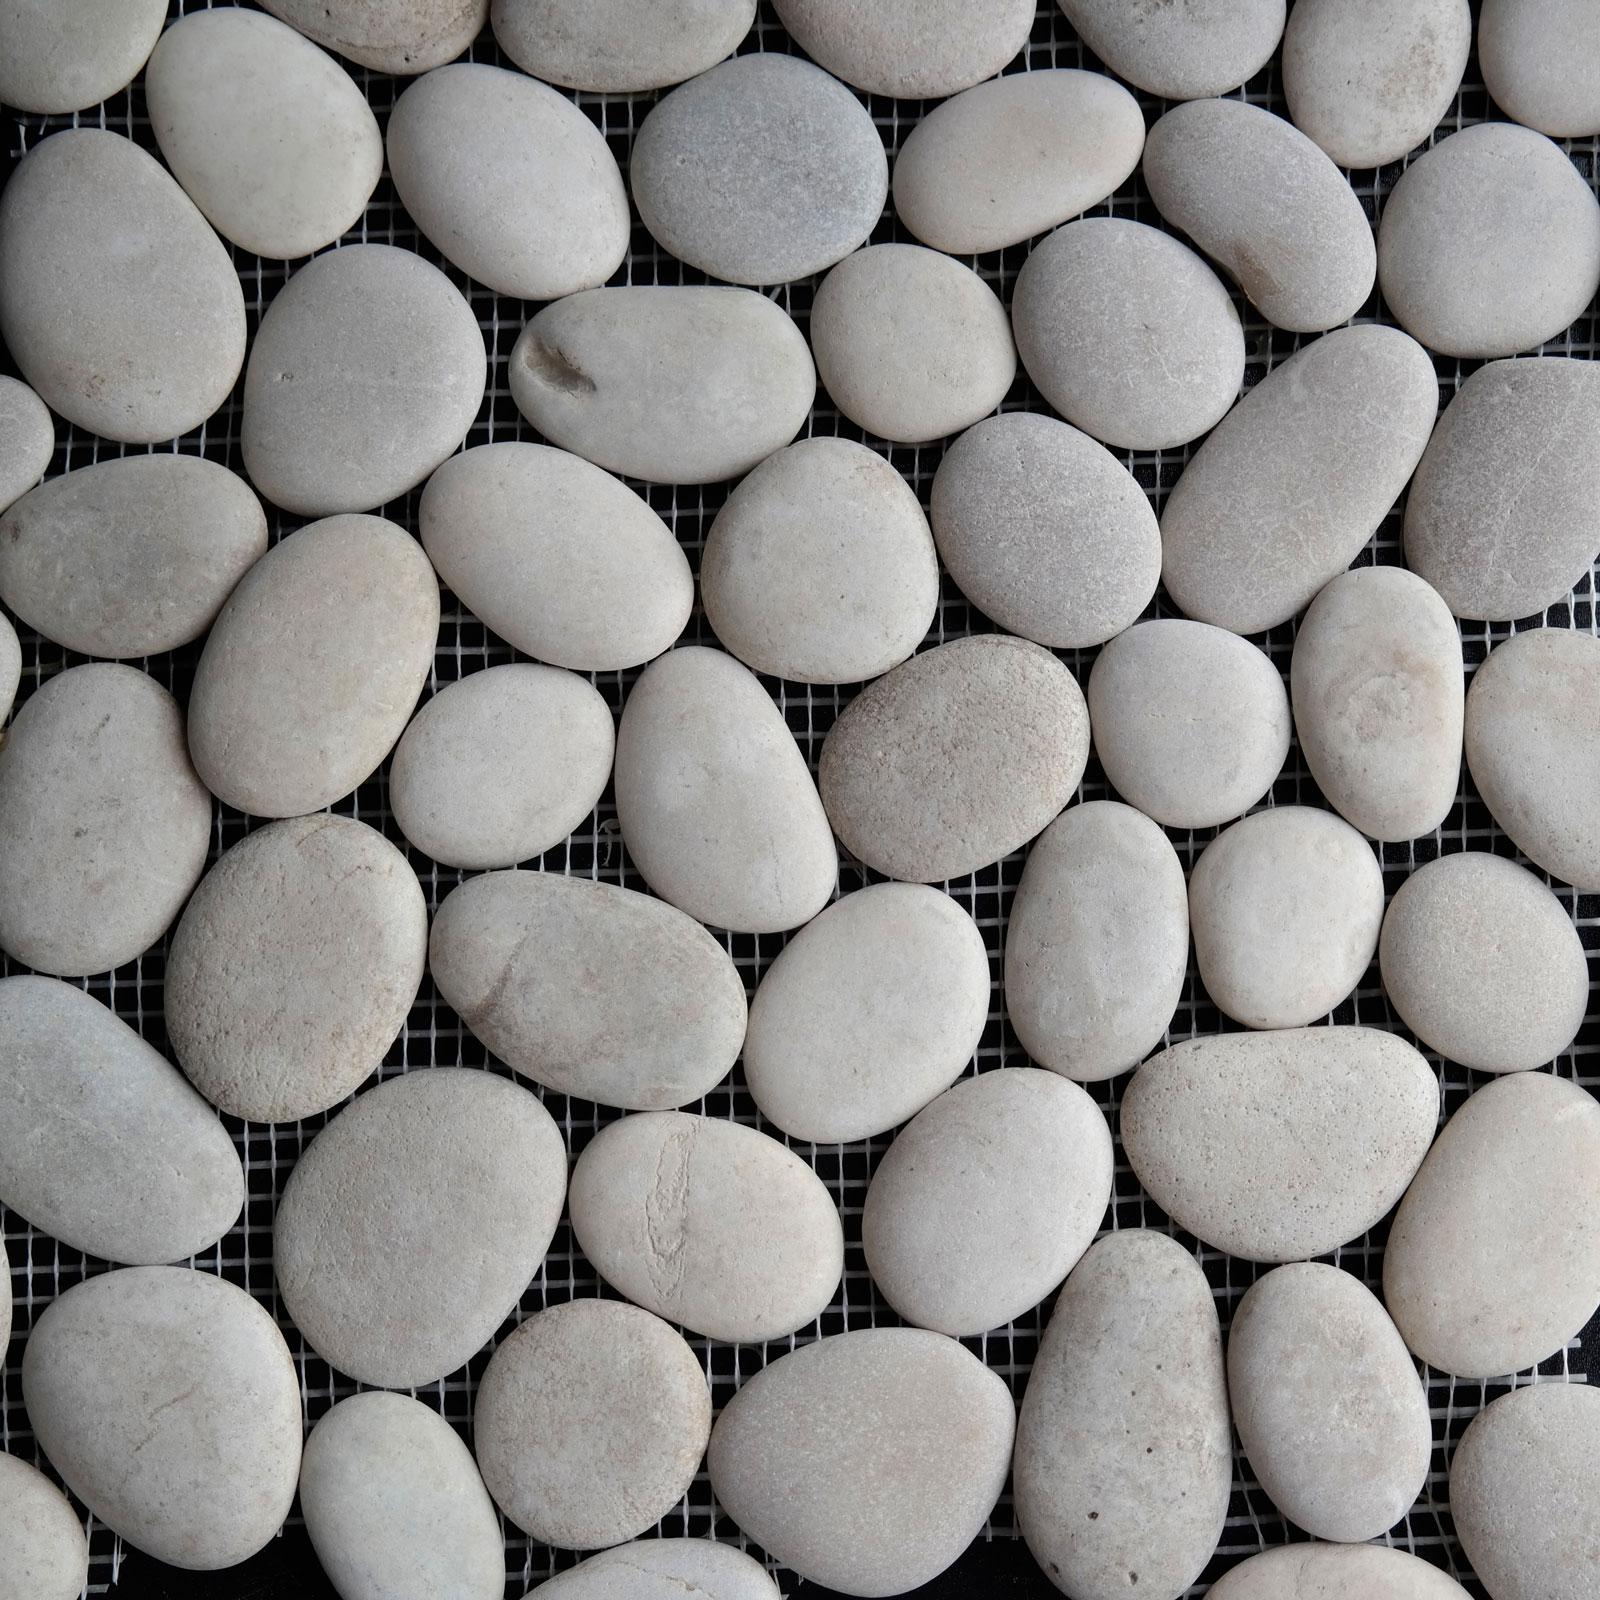 Beige Round Stone Pebble Mosaic